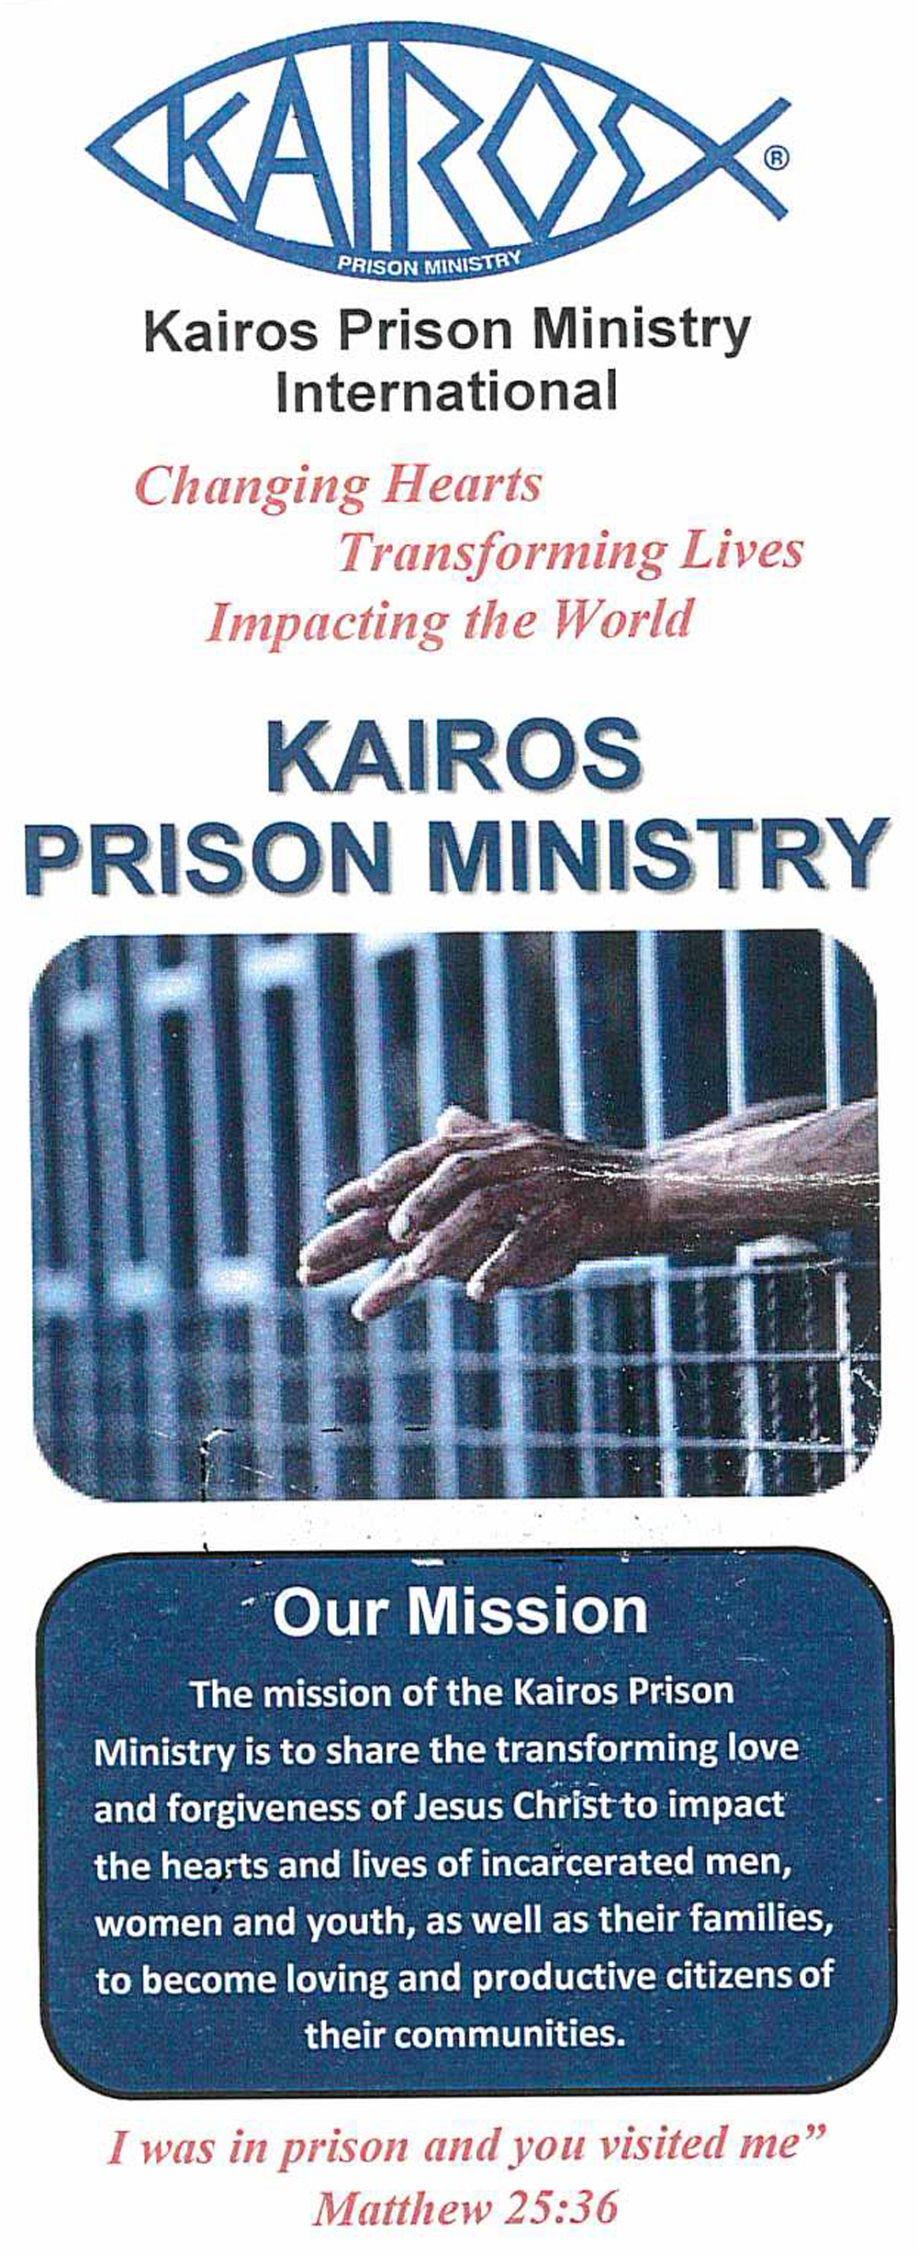 Kairos ministry pamphlet